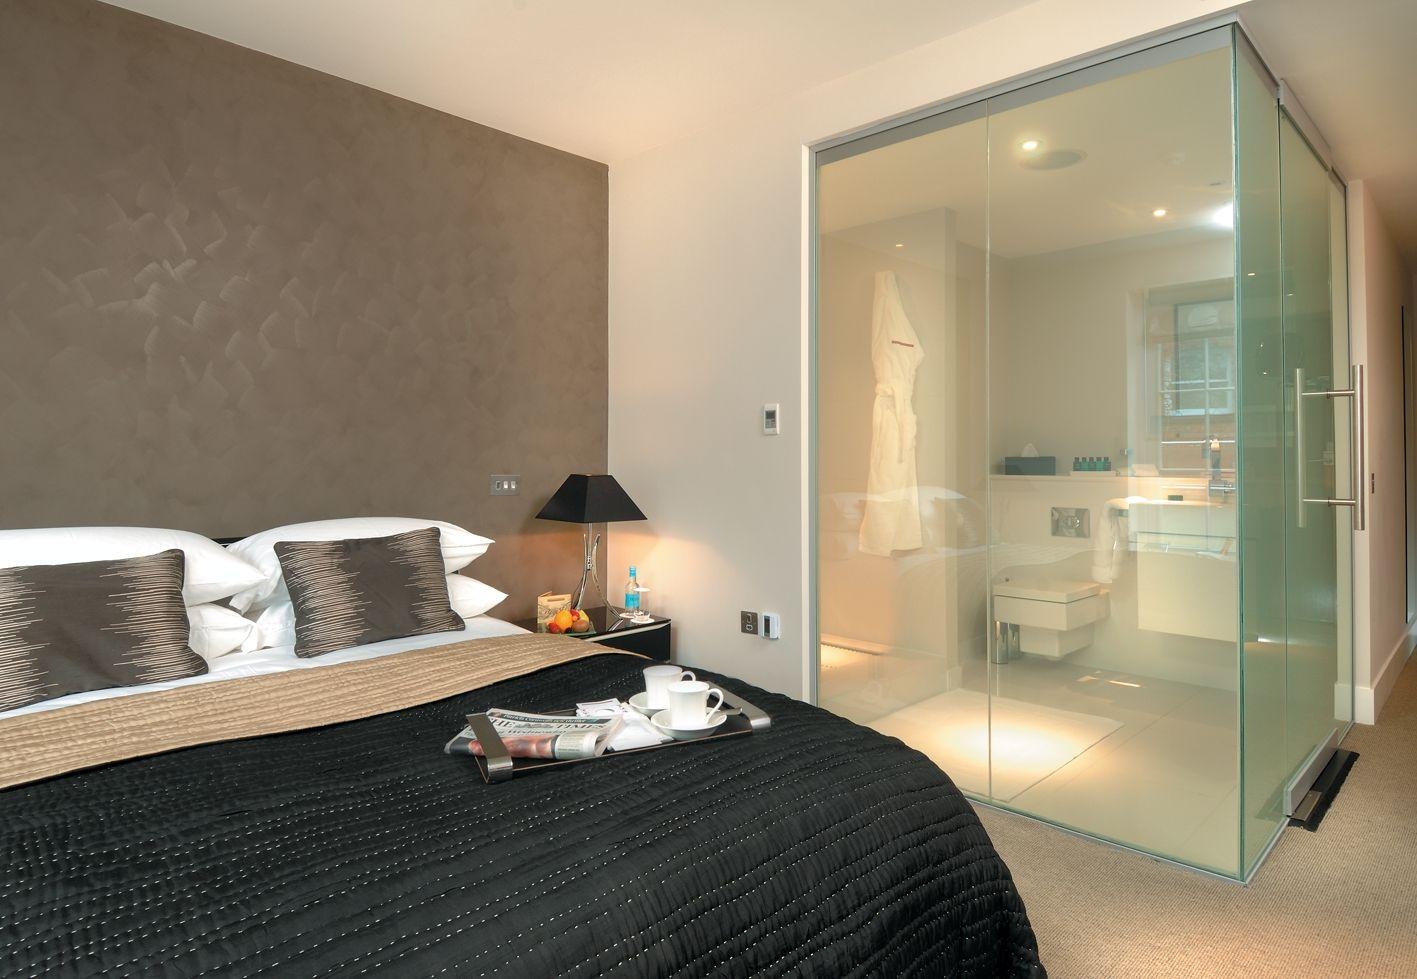 awesome bedroom hotel with transparent bathroom for 2013 design rh pinterest com